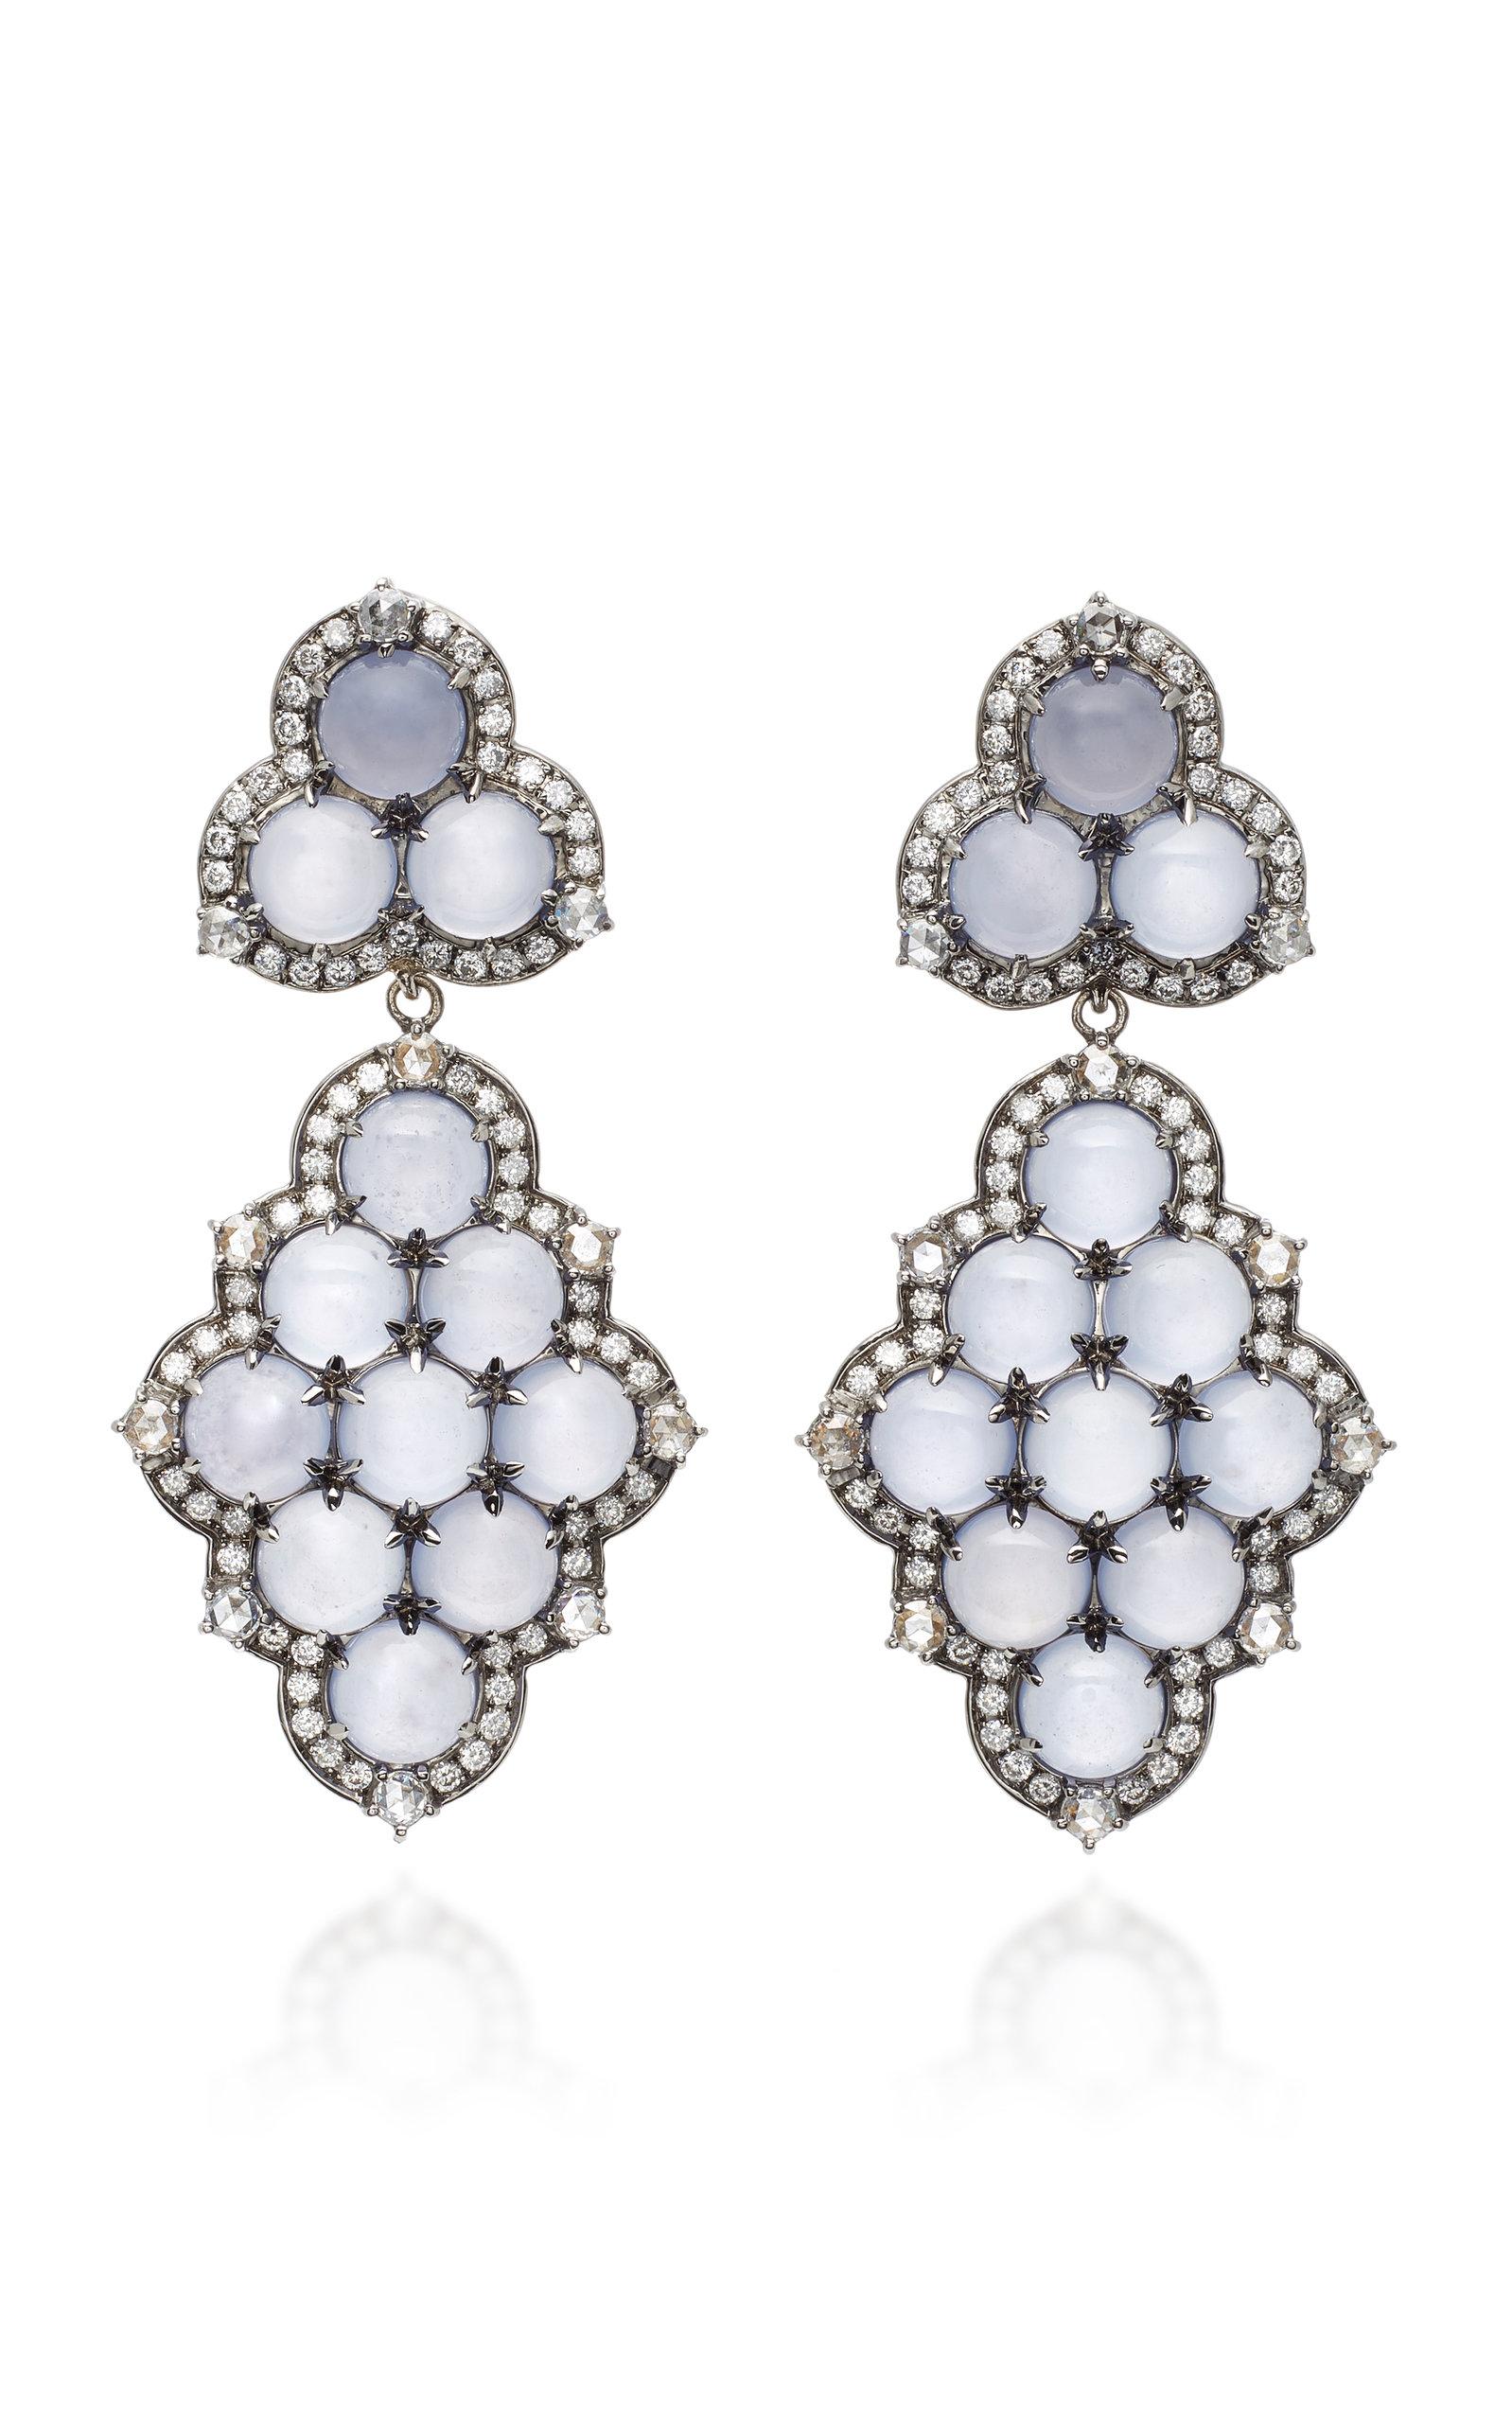 Detachable 18K White Gold Black Rhodium Chalcedony and Diamond Earrings Nam Cho nWZ437n